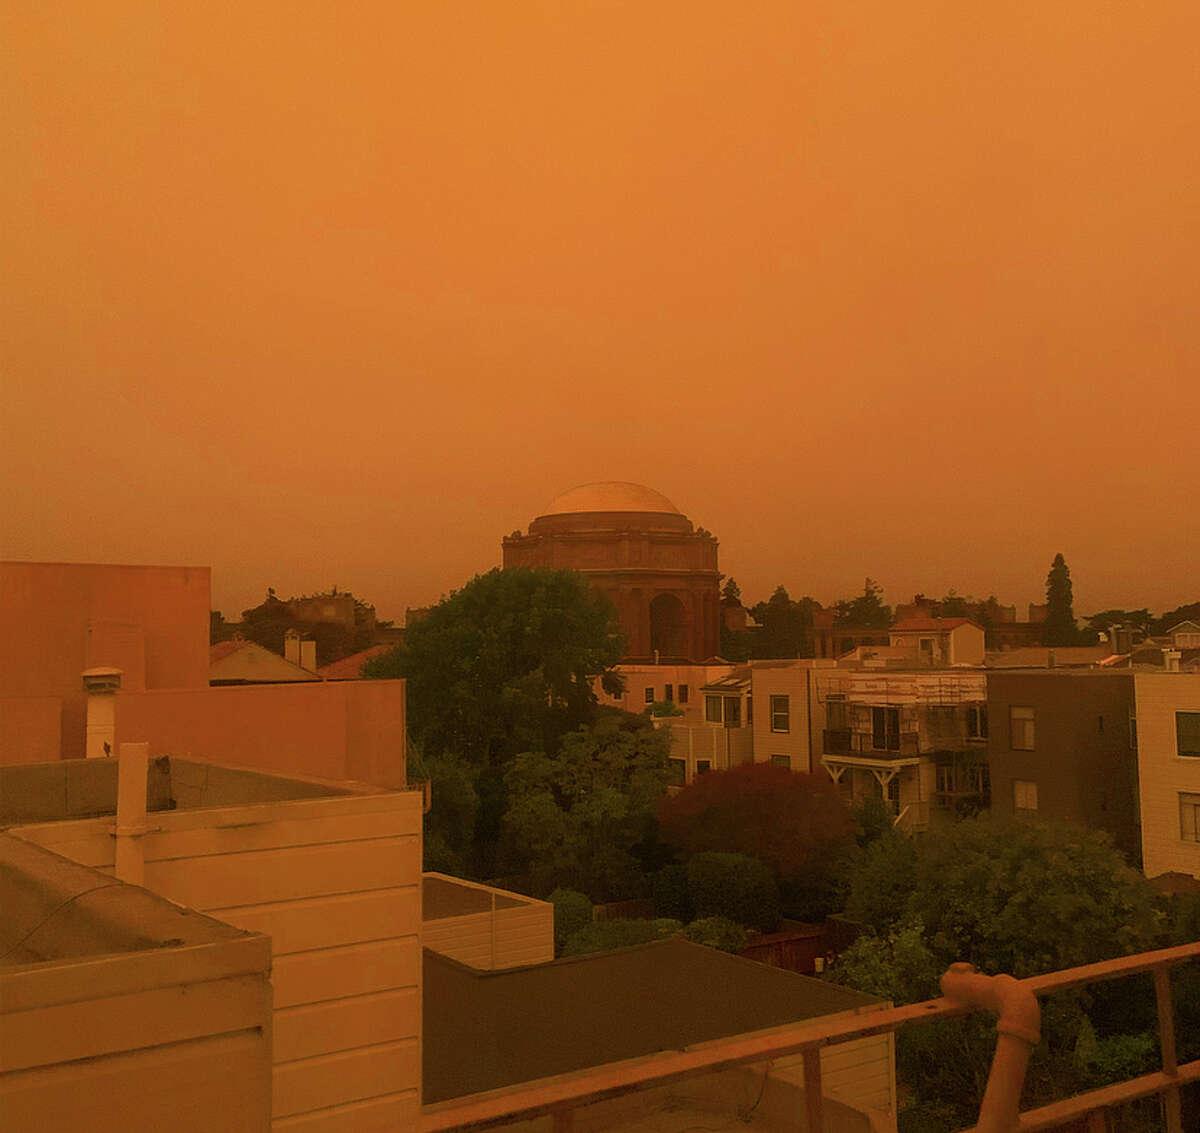 The orange sky above the Palace of Fine Arts on Sept. 9, 2020.